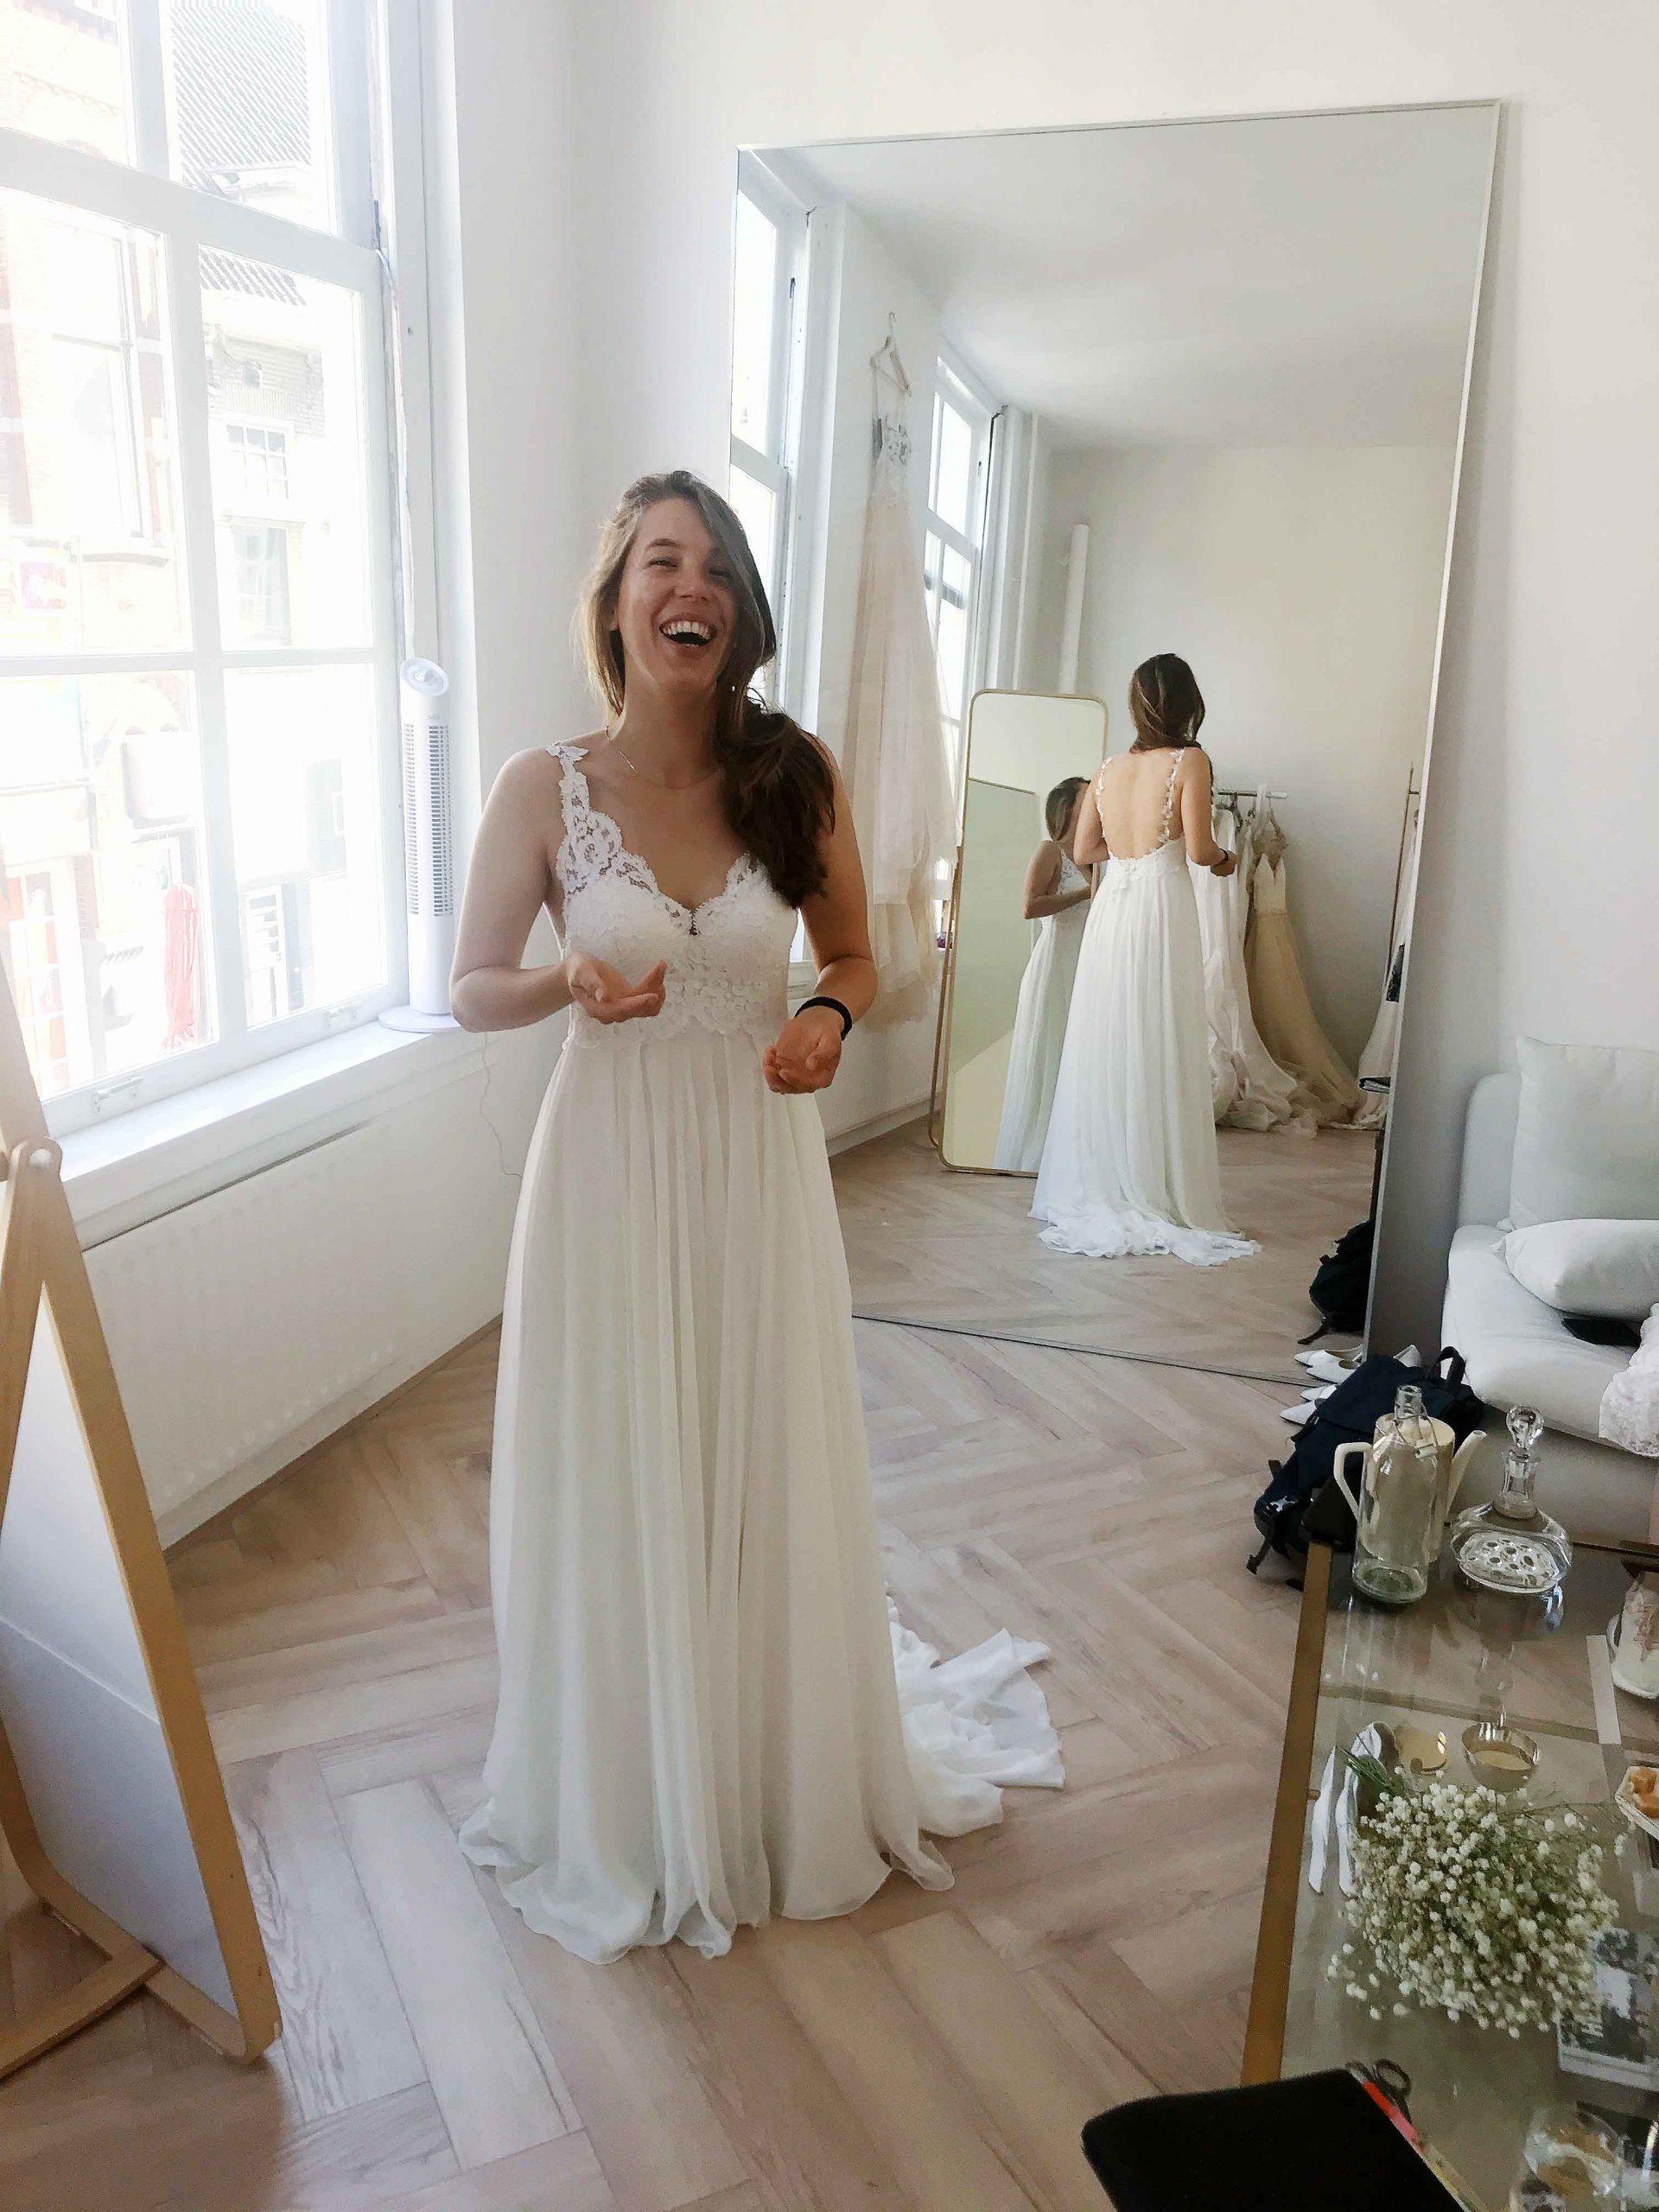 Duurzame trouwjurk laten maken, Hanneke Peters Couture, duurzame bruiloft, duurzaam trouwen, trouwjurk Lyocell, bohemian trouwjurk duurzaam, organische trouwjurk. Verantwoorde trouwjurk, ecologische bruidsjurk